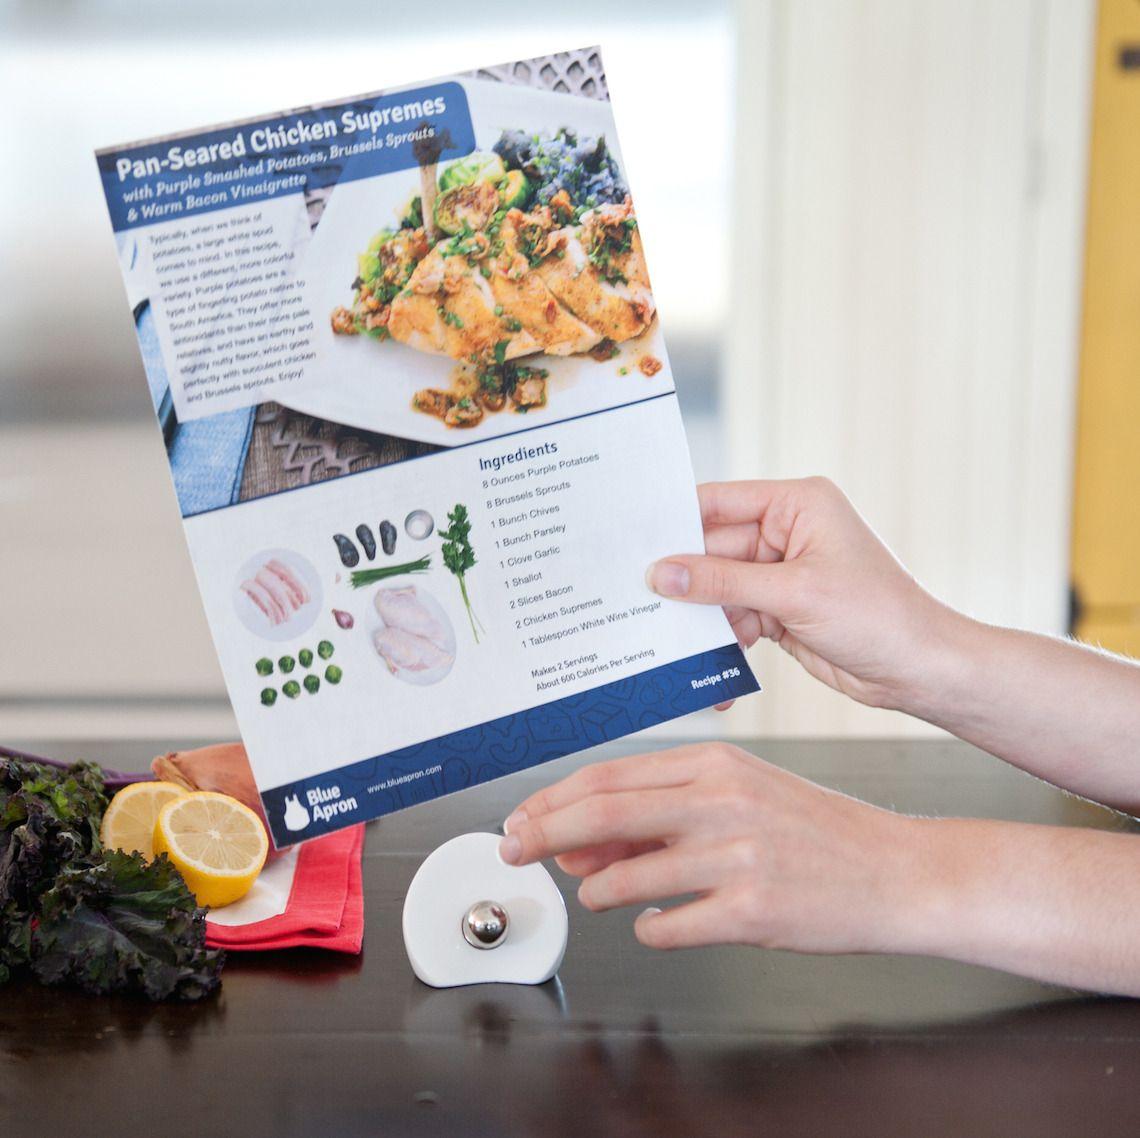 Blue apron zester - Blue Apron Recipe Card Holder